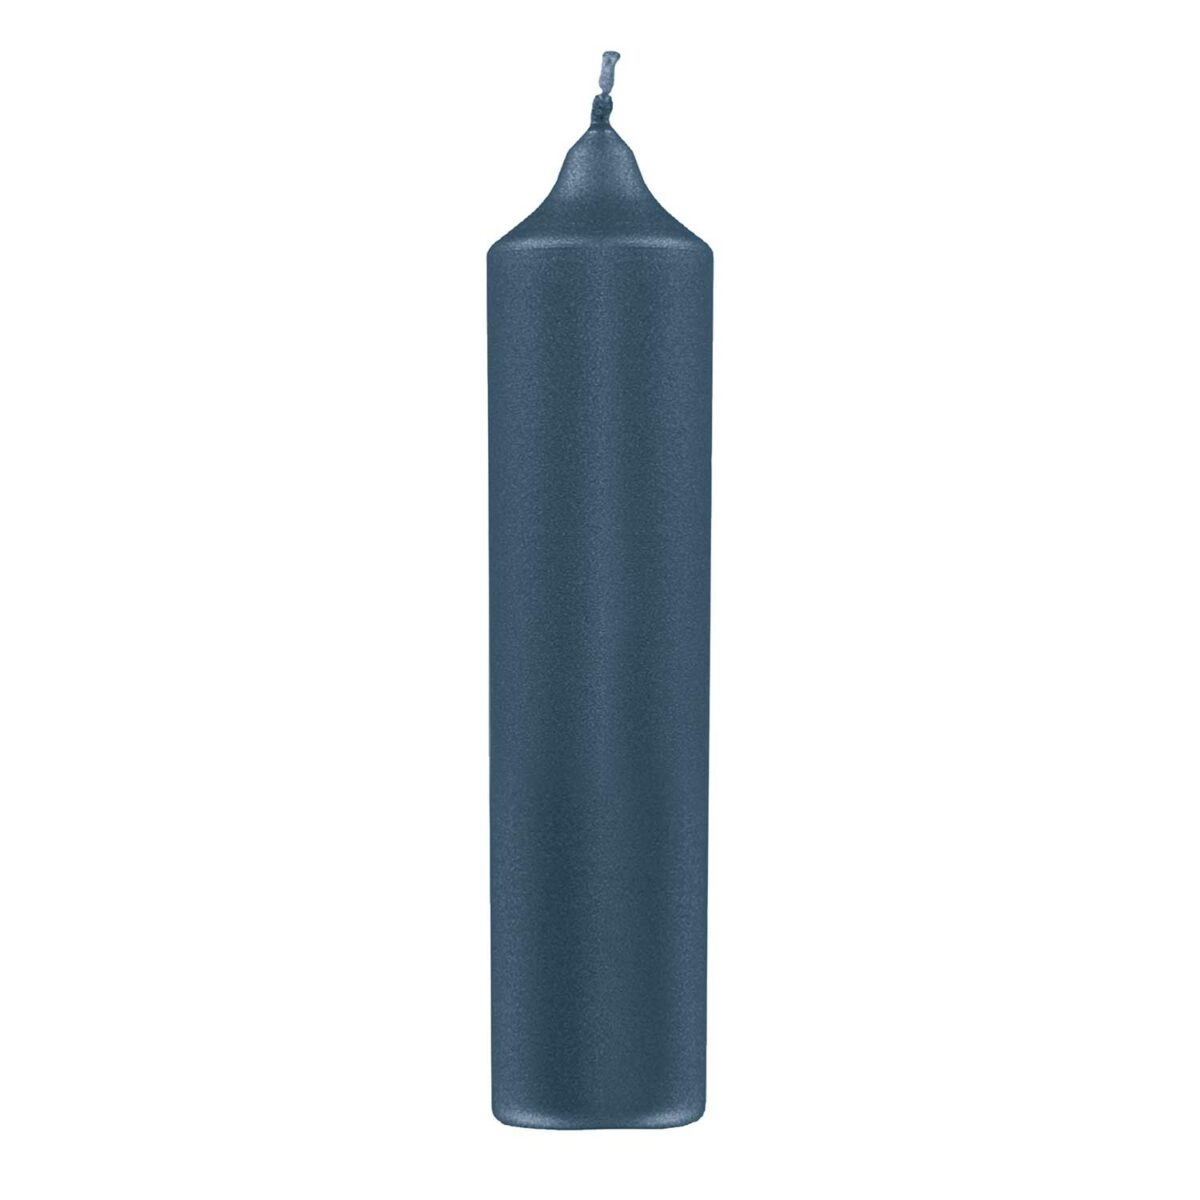 Titankerzen metallic H 20 cm | D 4 cm (12 / 24 Stück)